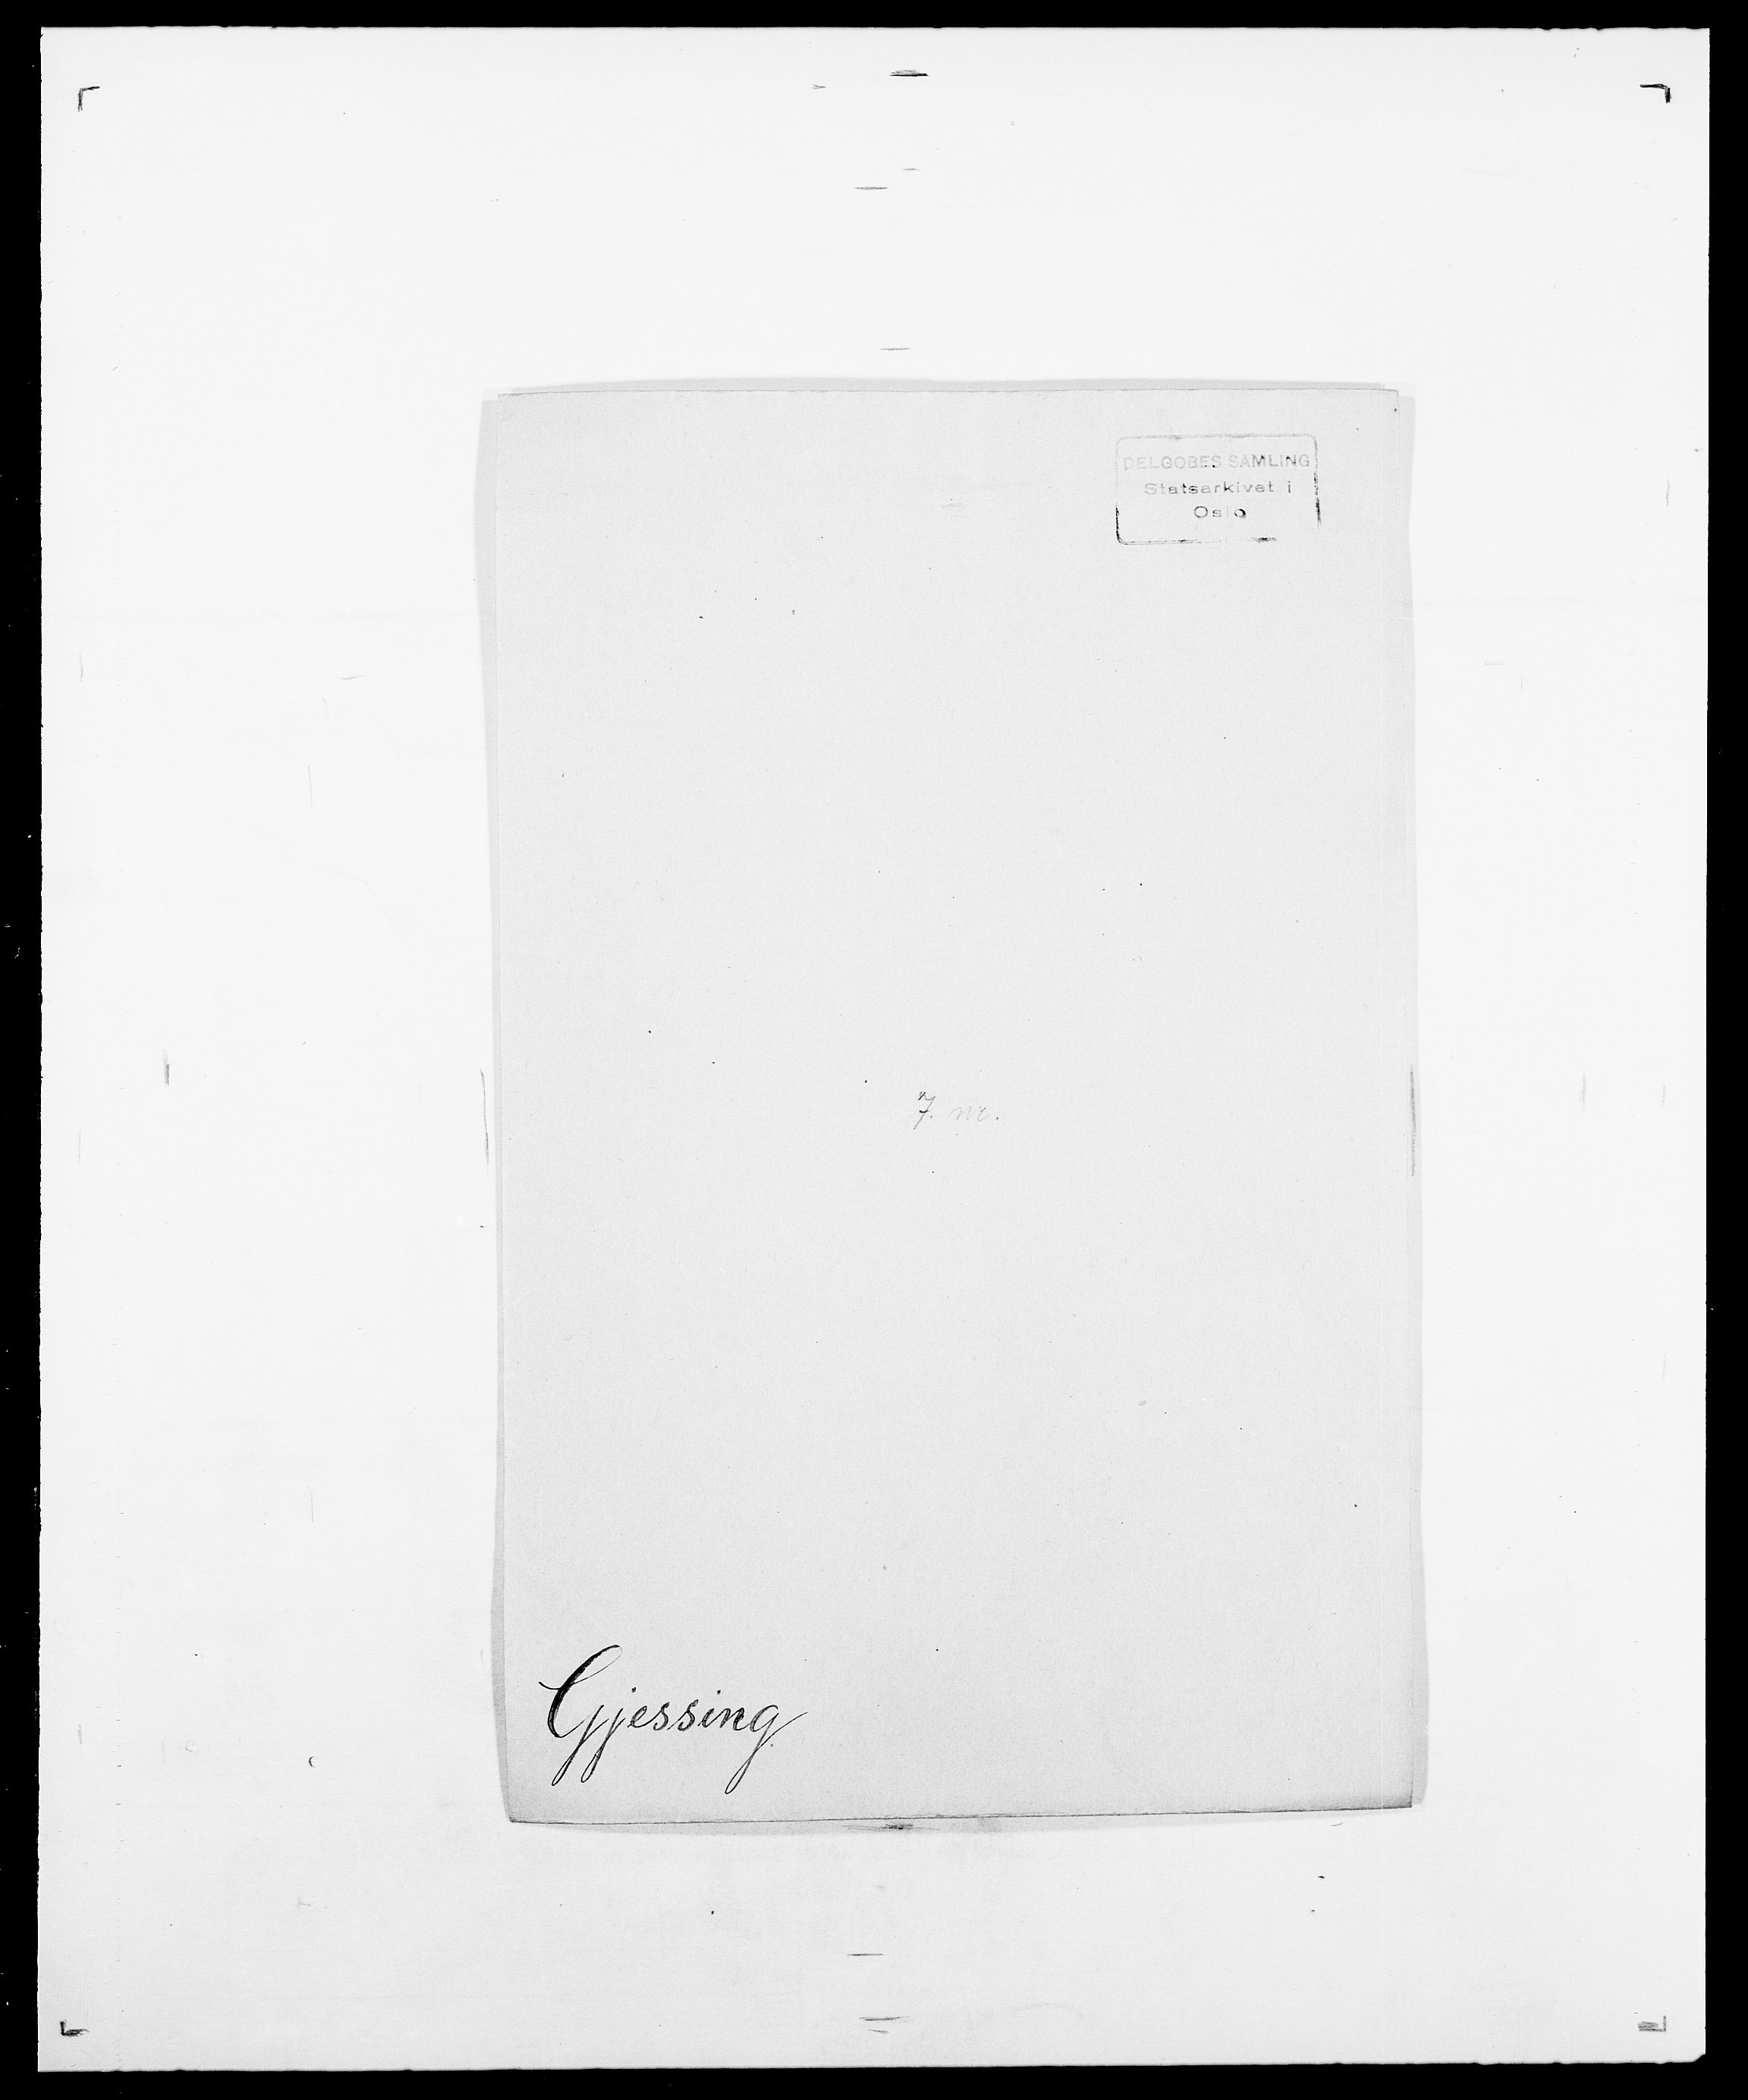 SAO, Delgobe, Charles Antoine - samling, D/Da/L0014: Giebdhausen - Grip, s. 185